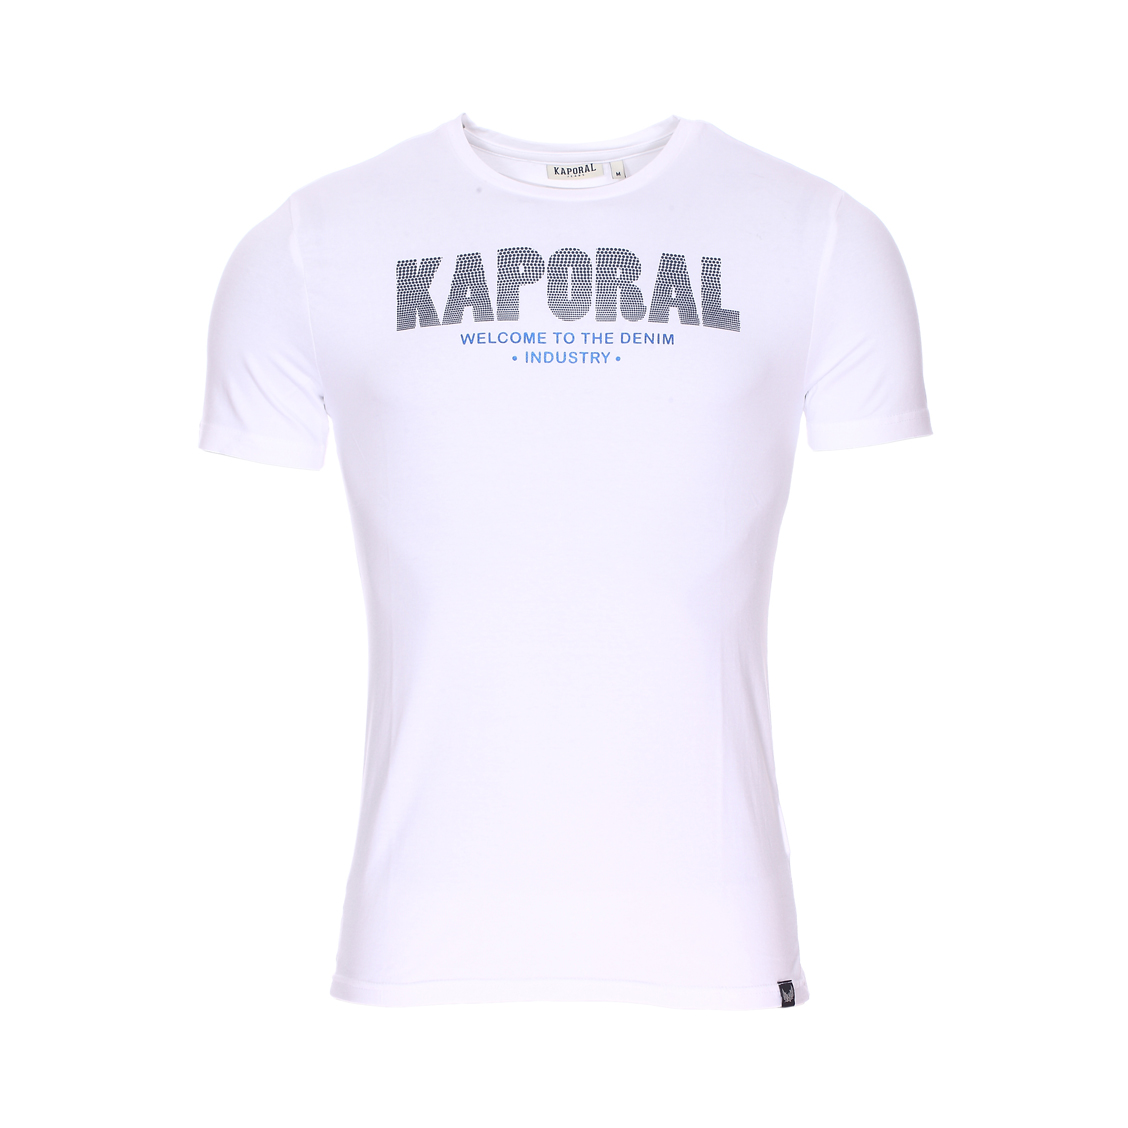 Tee-shirt col rond  niyoo en coton stretch blanc à flocage relief